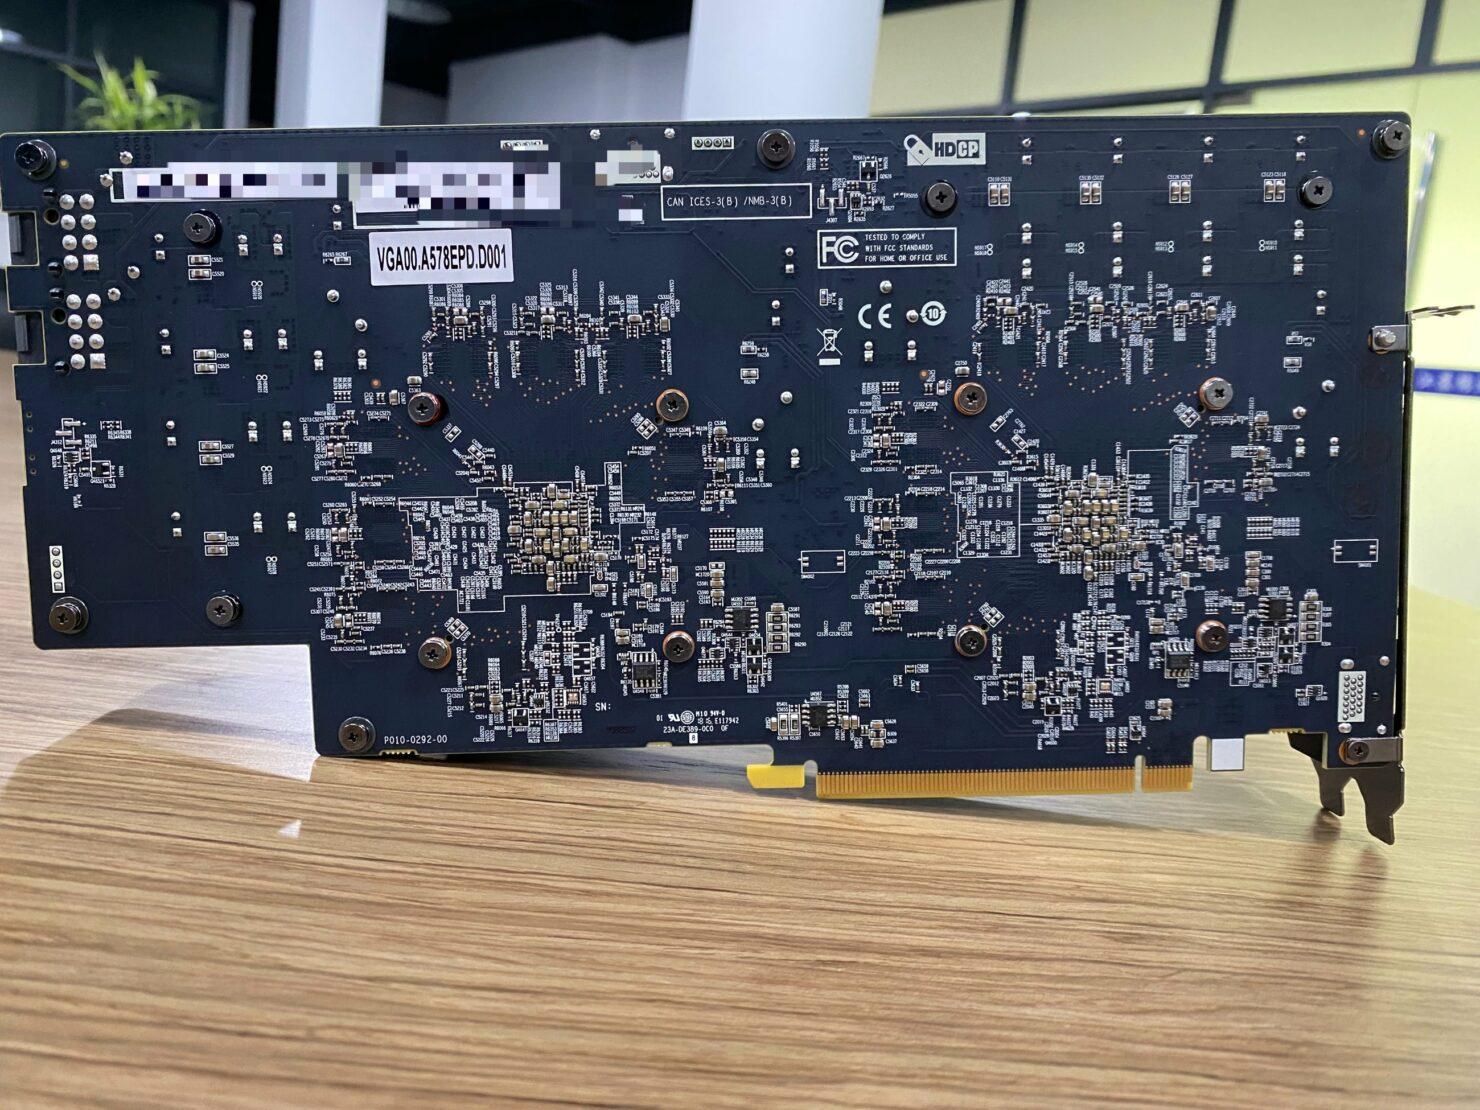 sapphire-radeon-rx-570-duo-_-twin-amd-polaris-gpu-mining-graphics-card-_ten